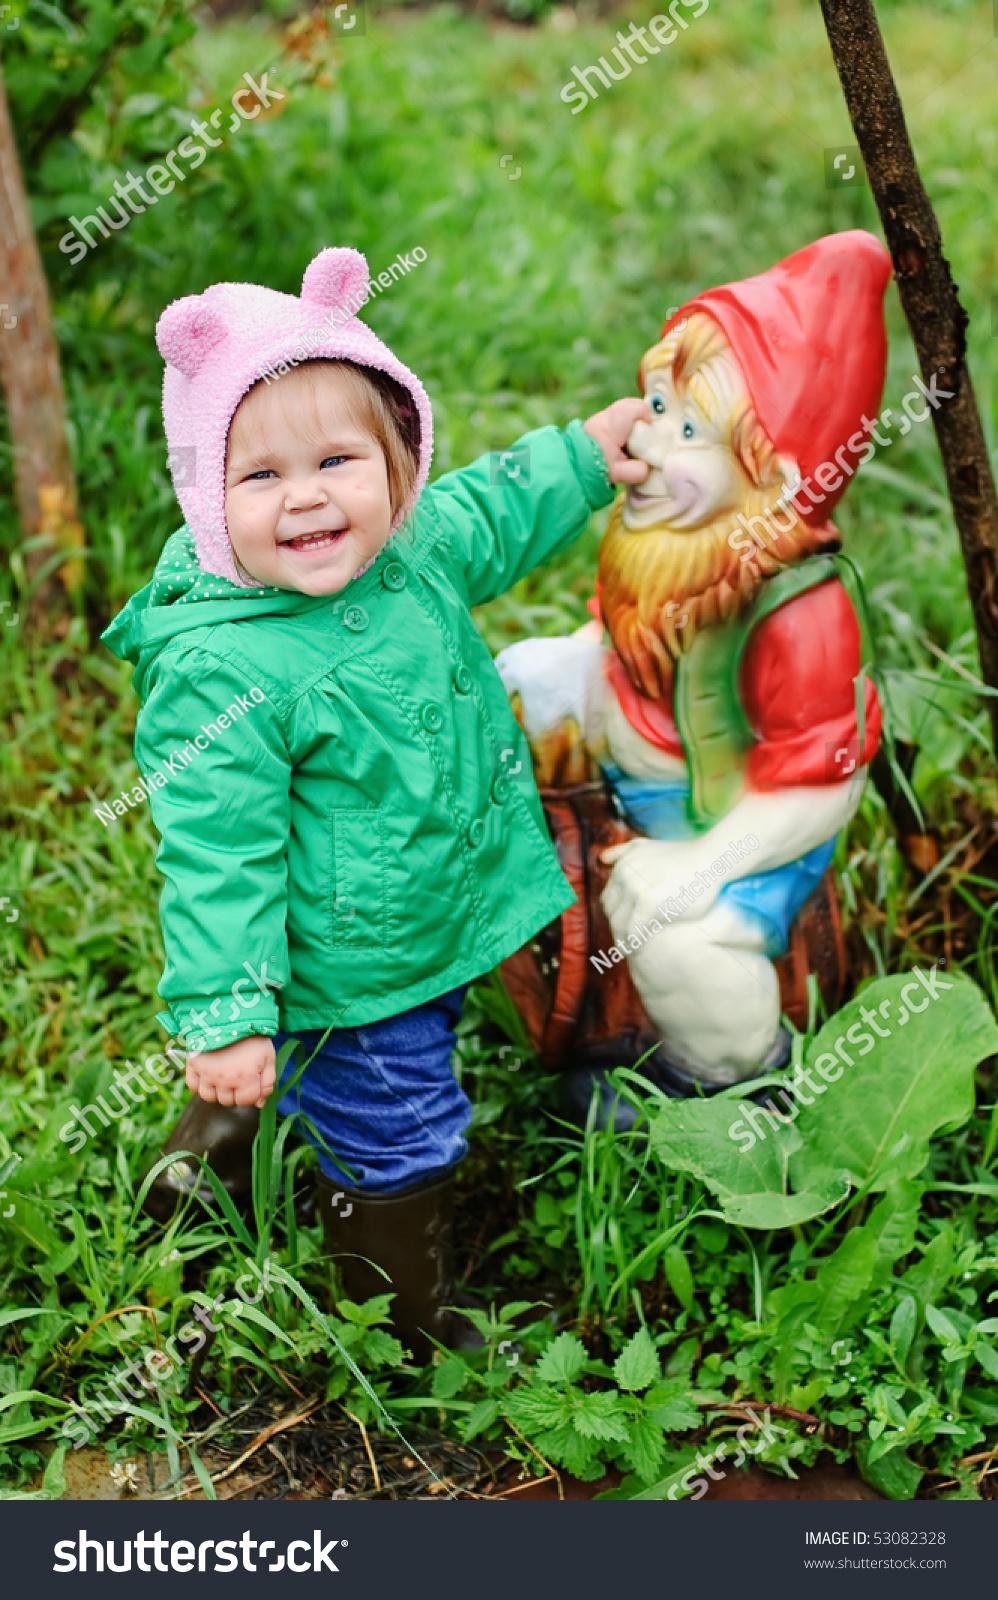 Girl Holding The Nose Of Garden Gnome